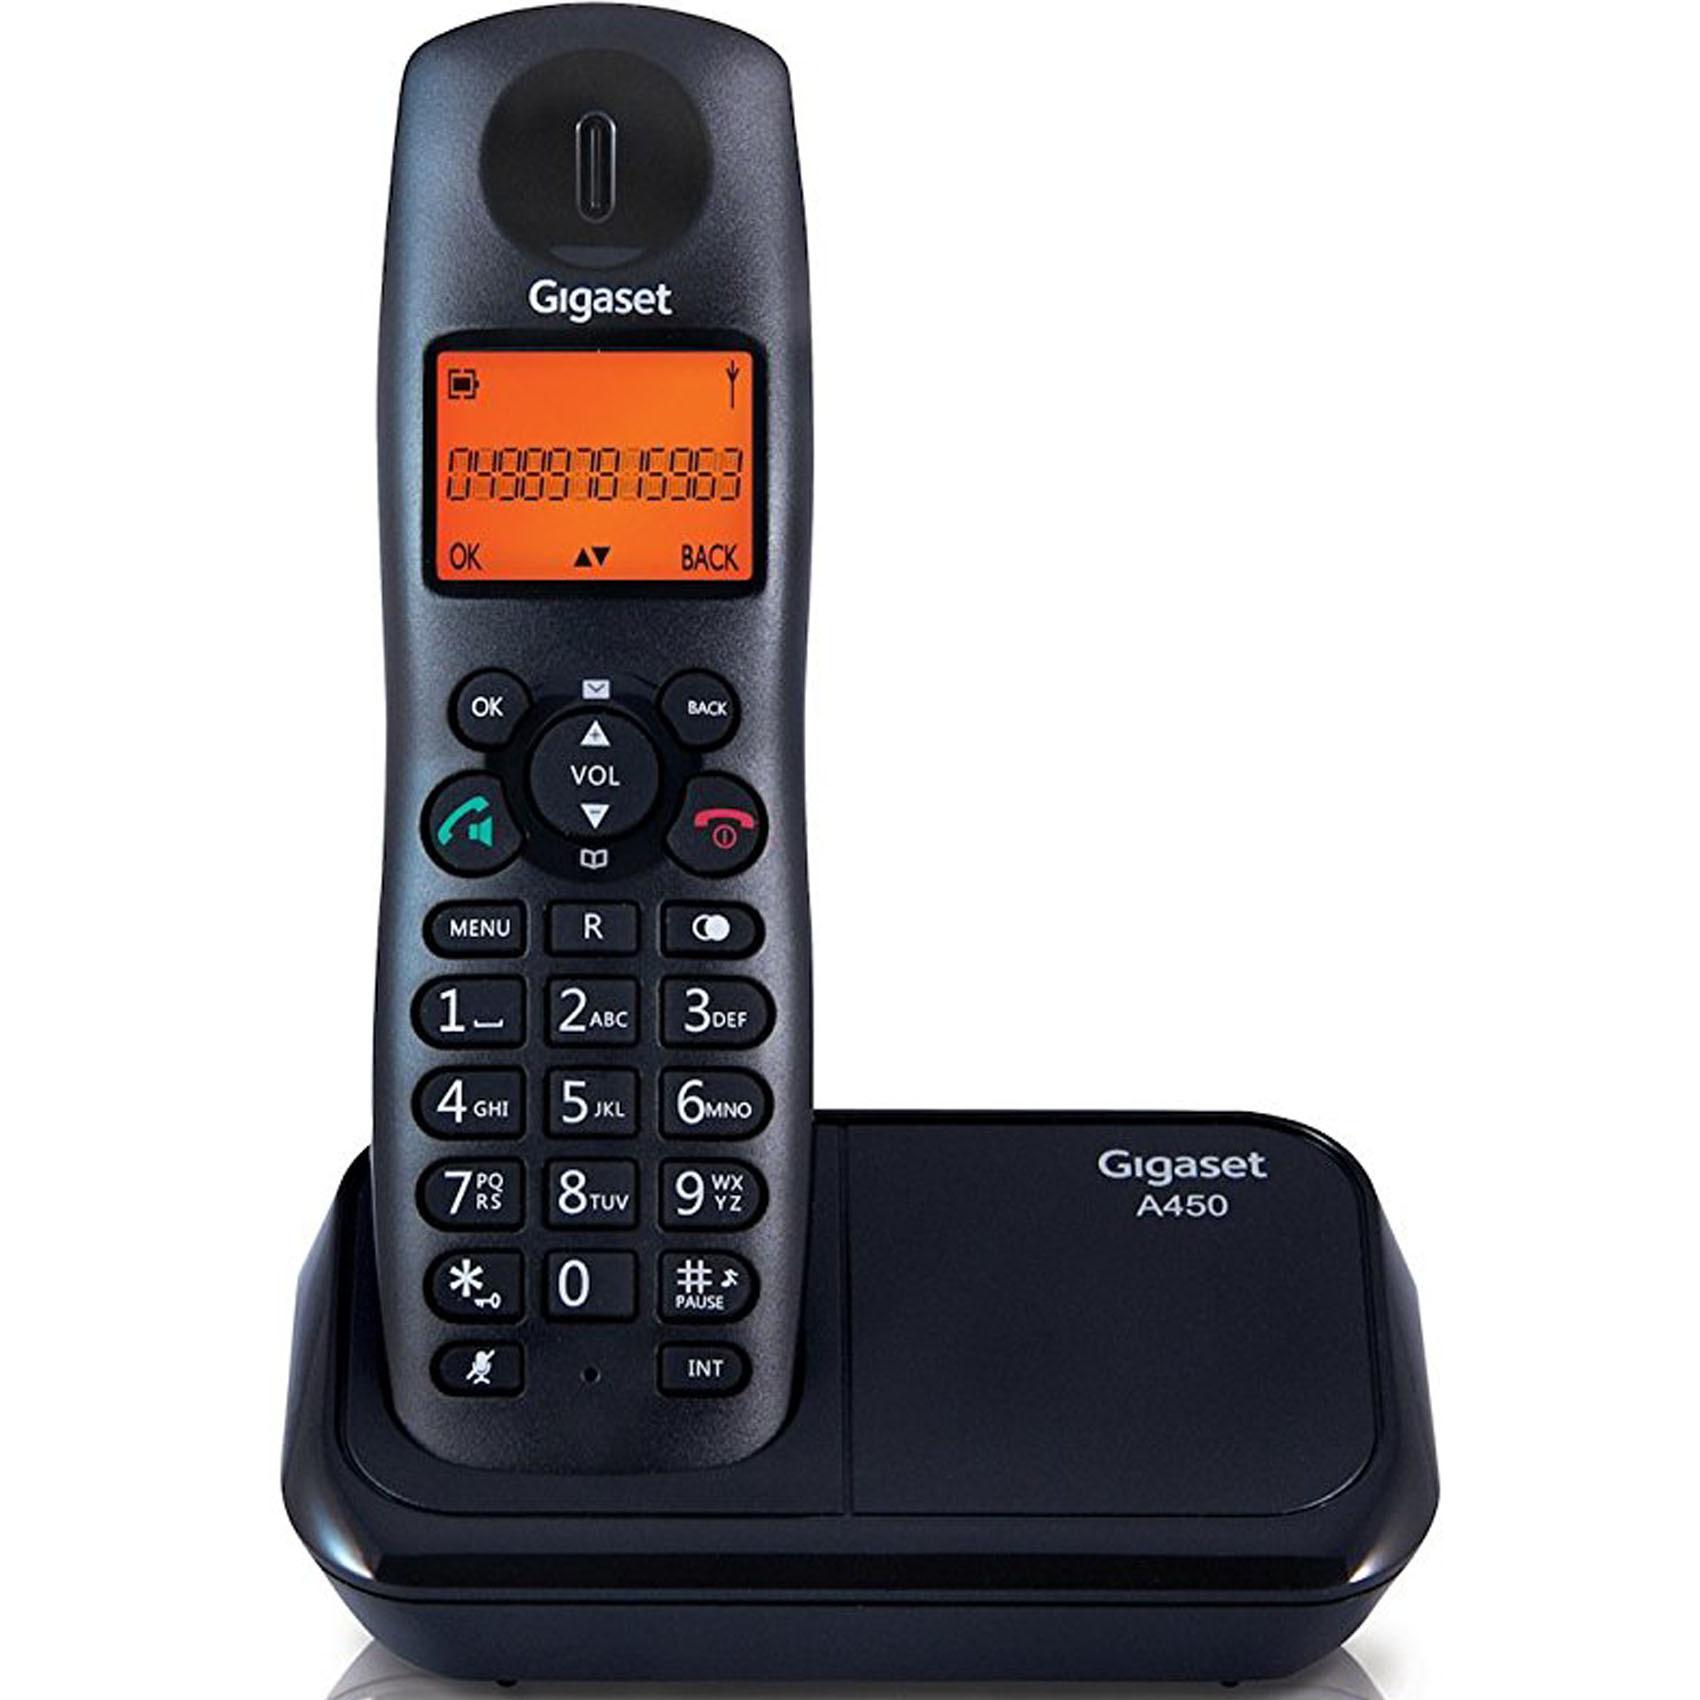 GIGASET A450 DECT PHONE